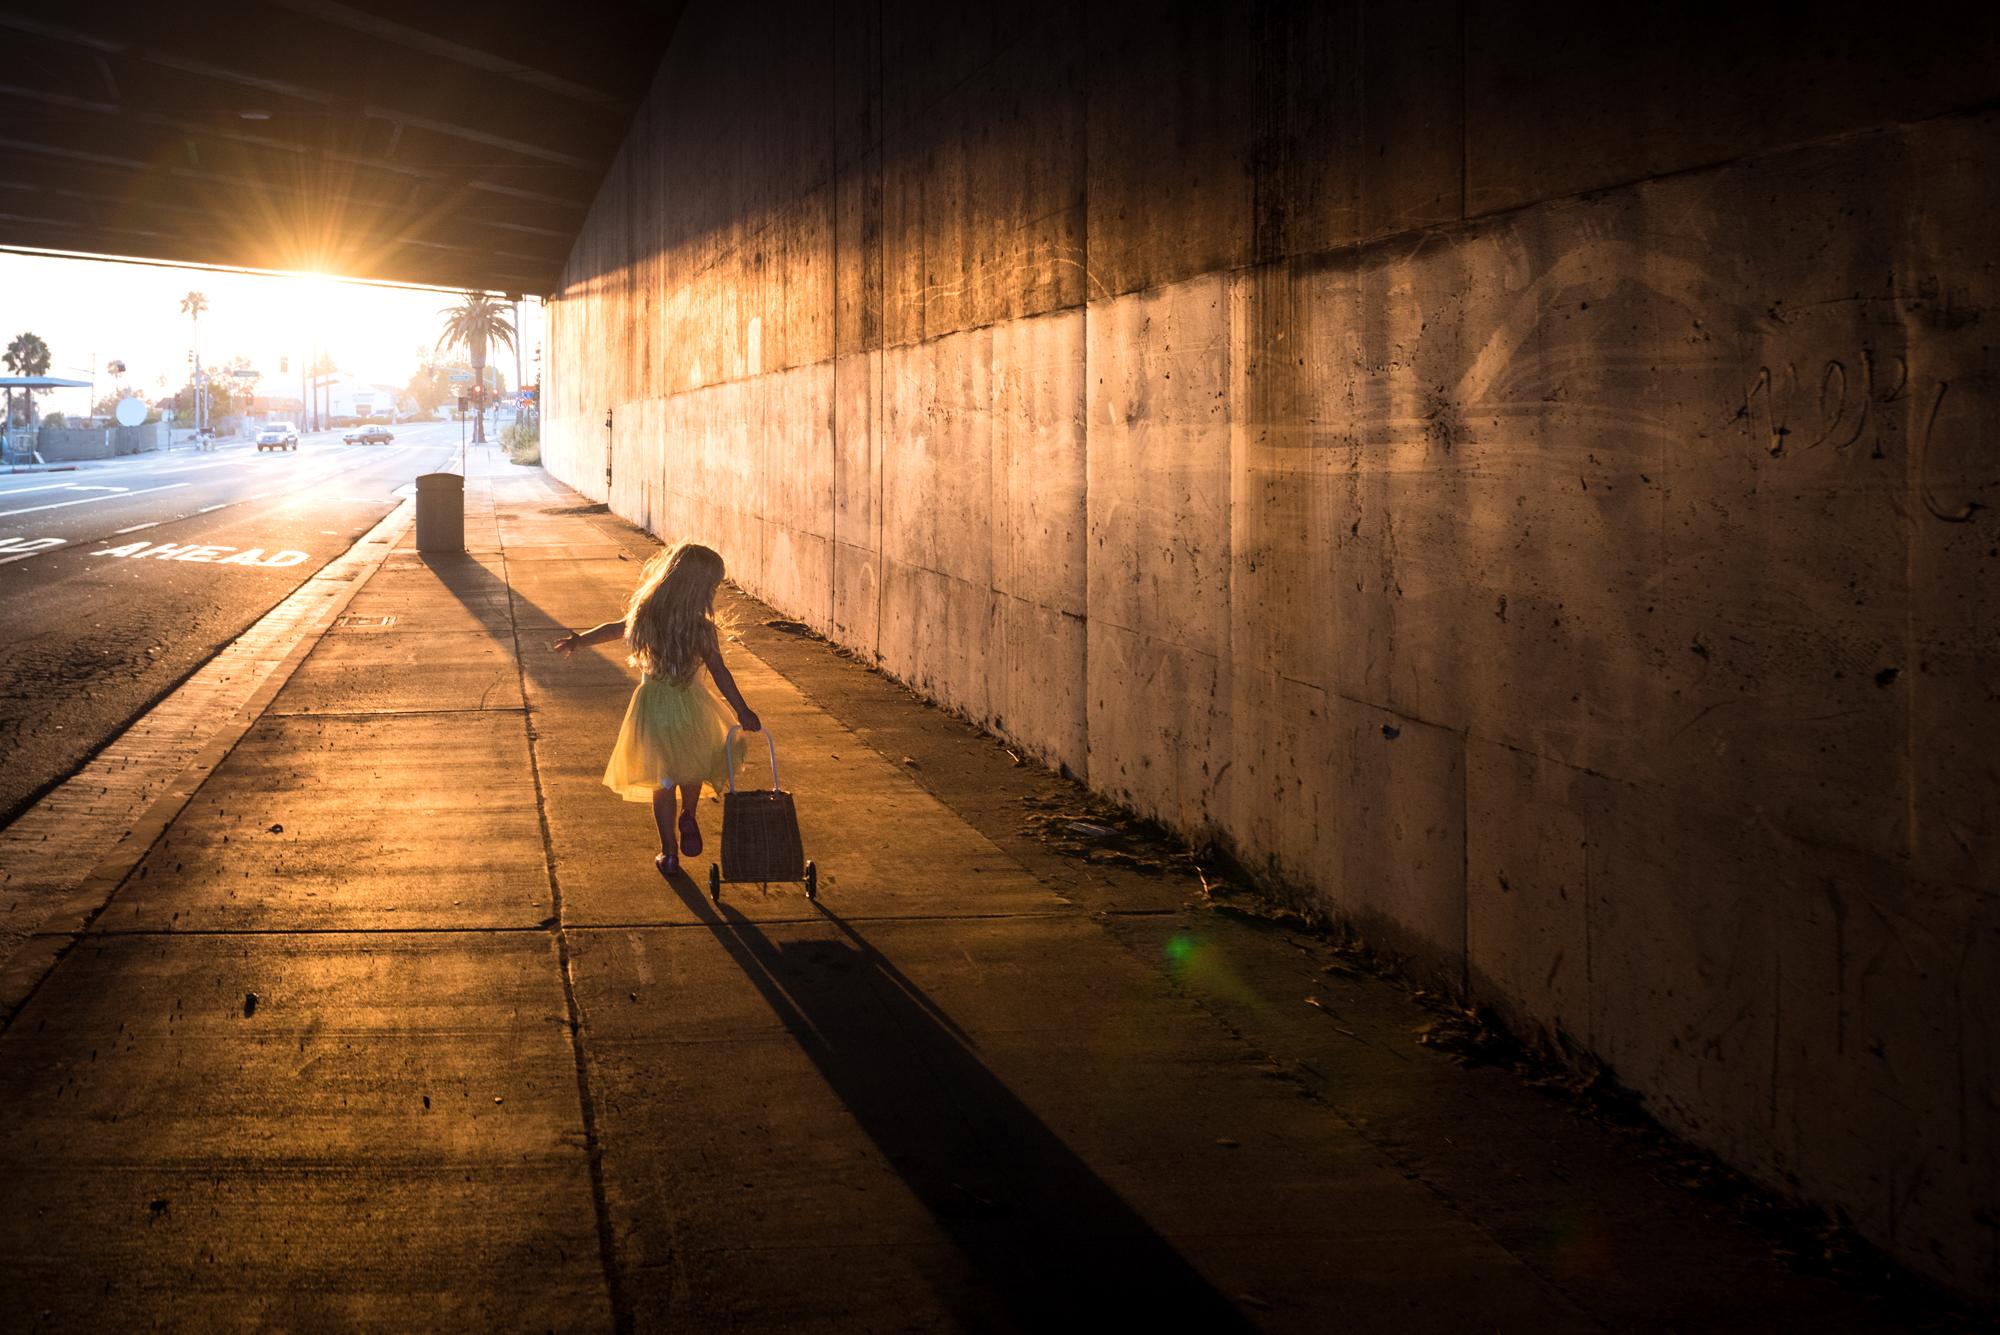 Natural-Light-Photography-Karlee-Hooper0009